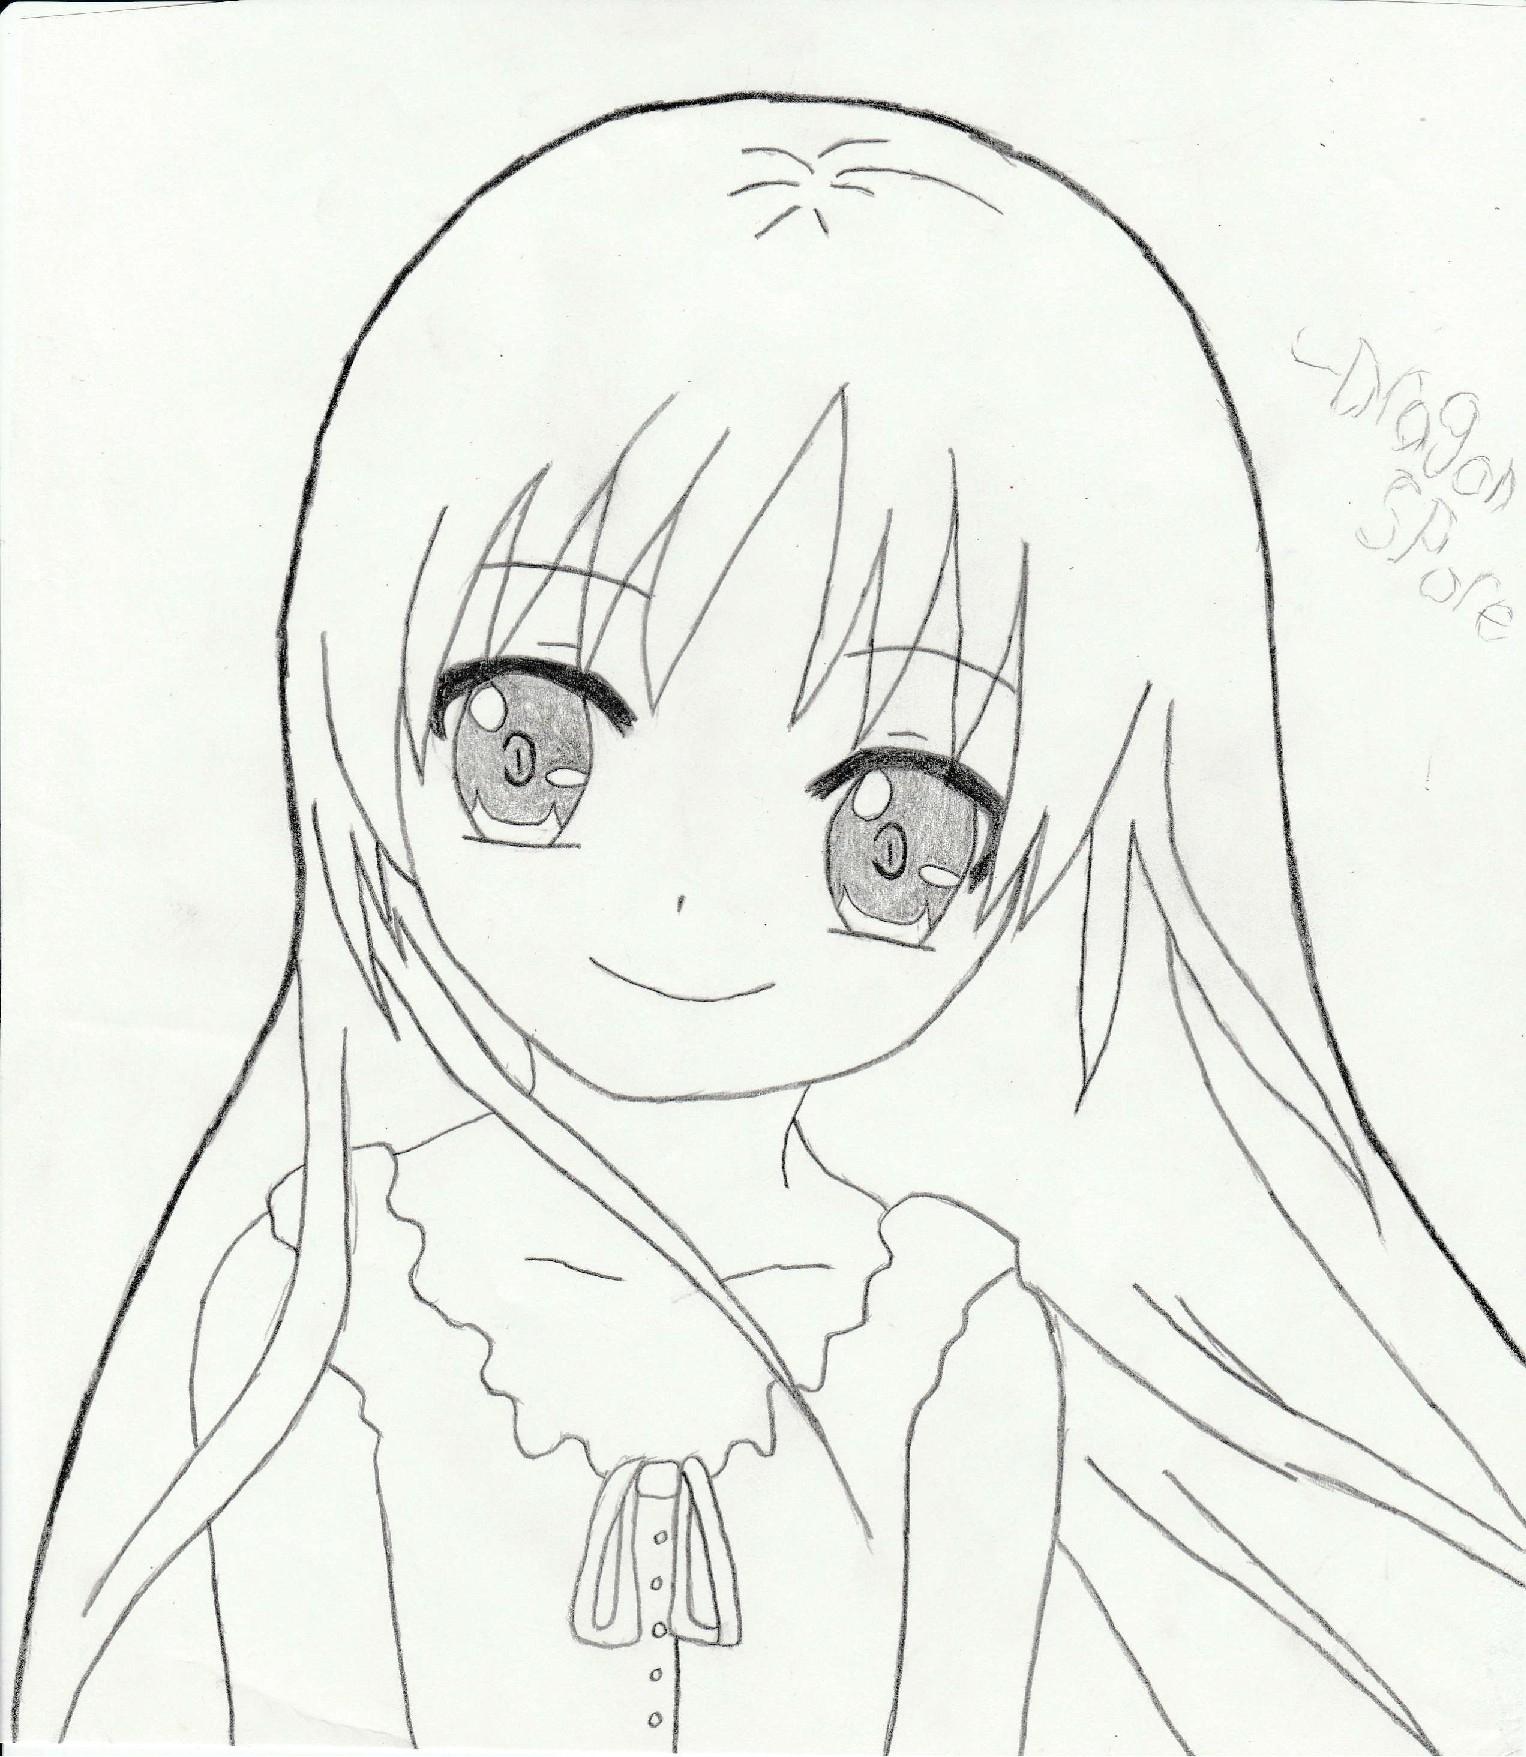 1526x1757 Cute Anime Girl Drawing Best Anime Girl Drawings Ideas